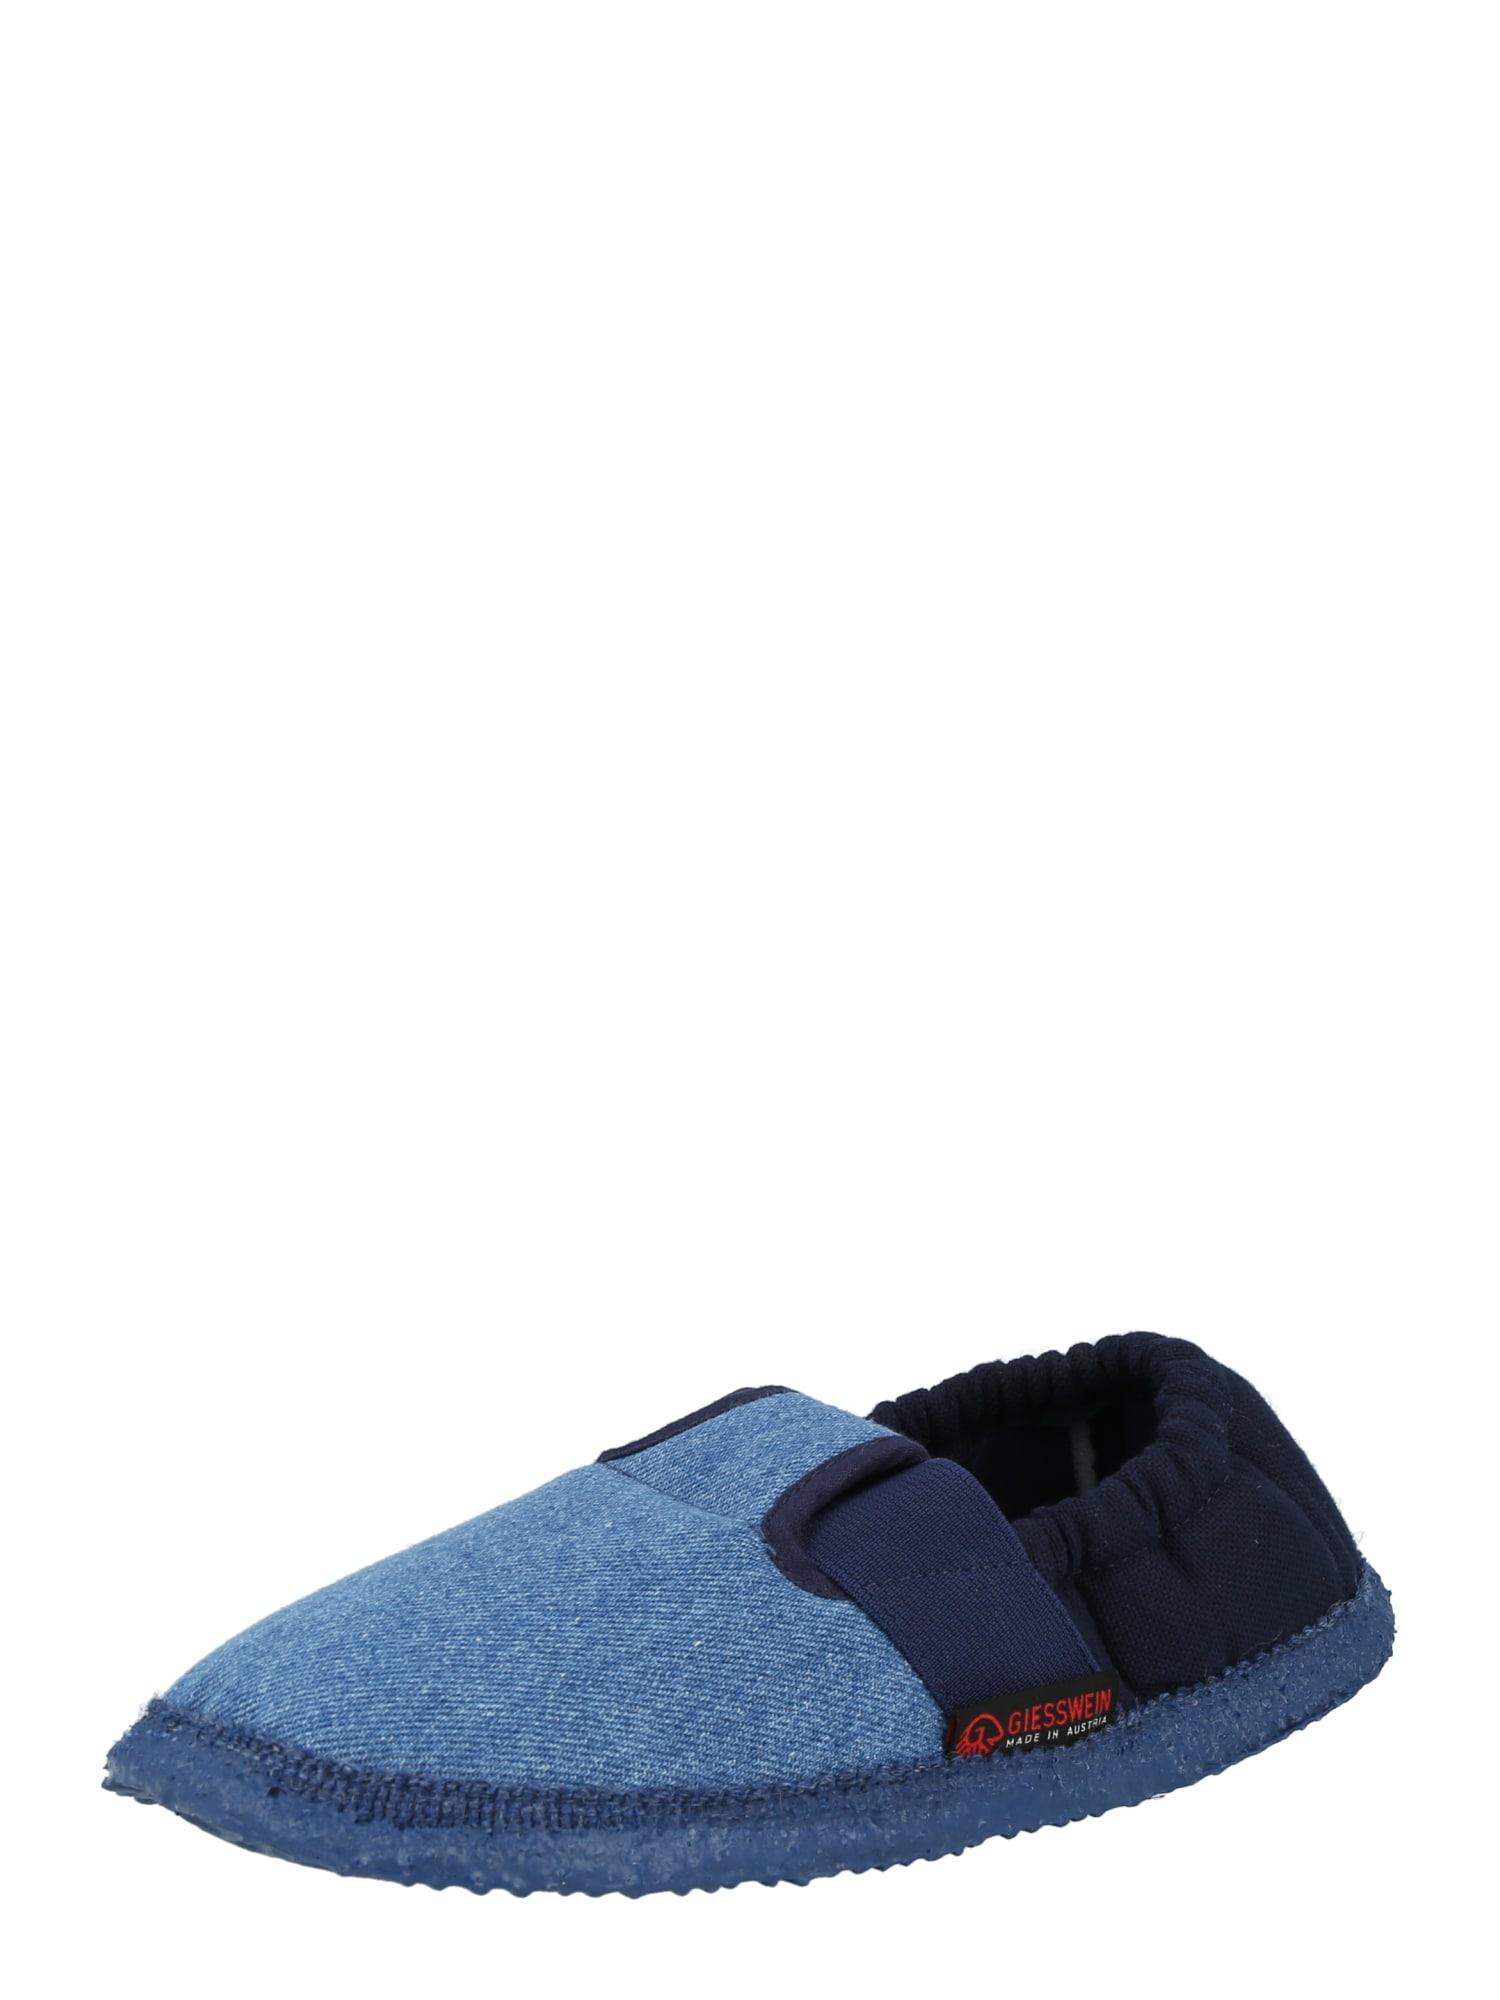 GIESSWEIN Pantofle 'Aichach'  modrá džínovina / tmavě modrá